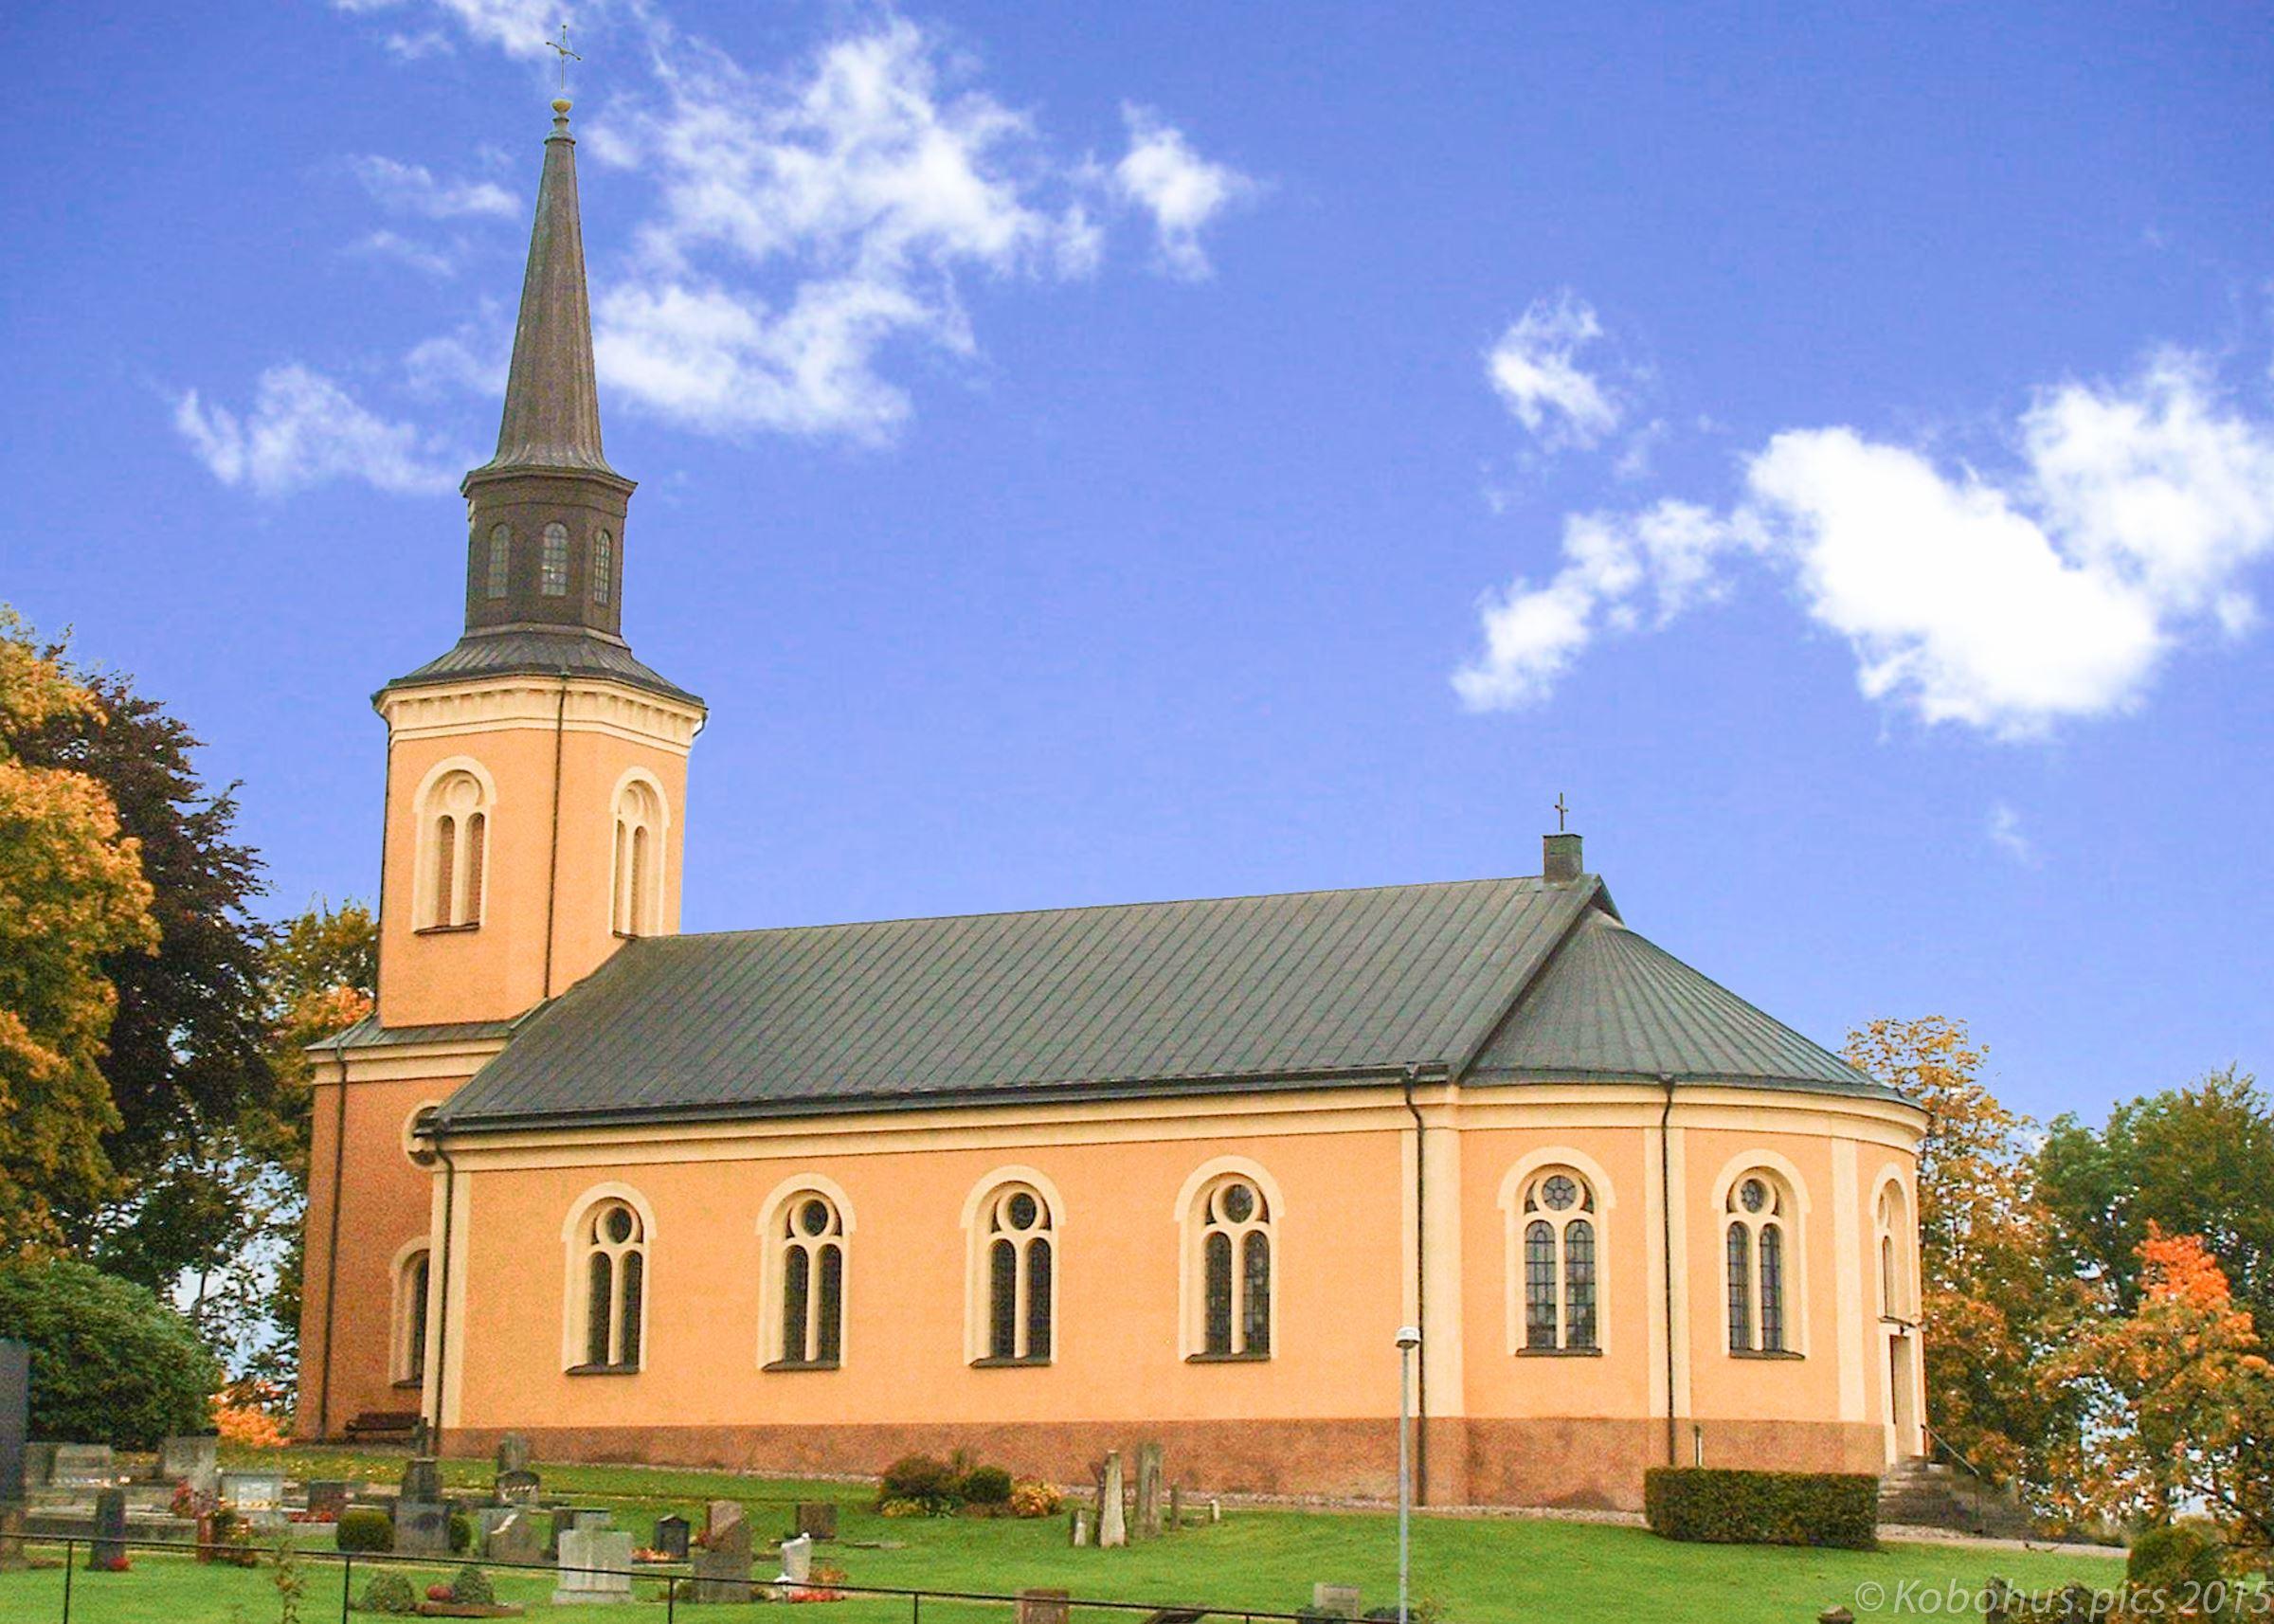 Norra Åkarps kyrka